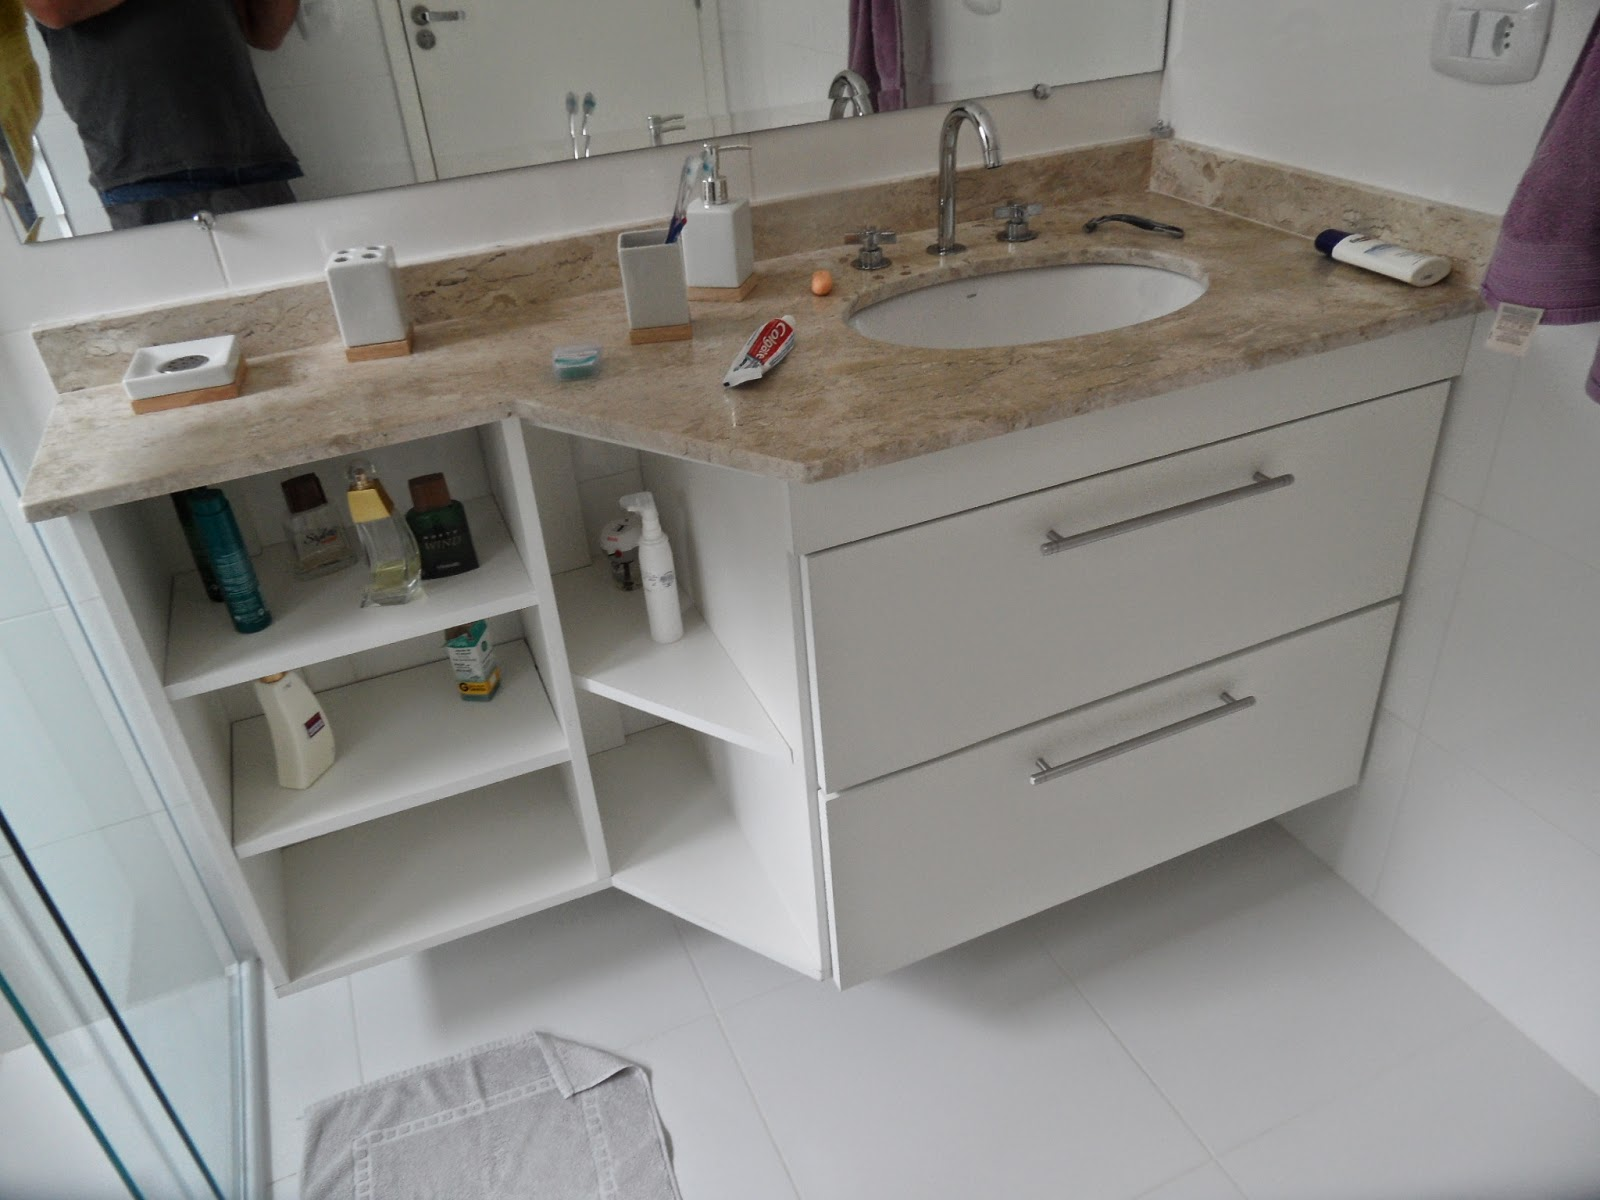 gabinete de banheiro gabinete de banheiro #5E4D3F 1600 1200